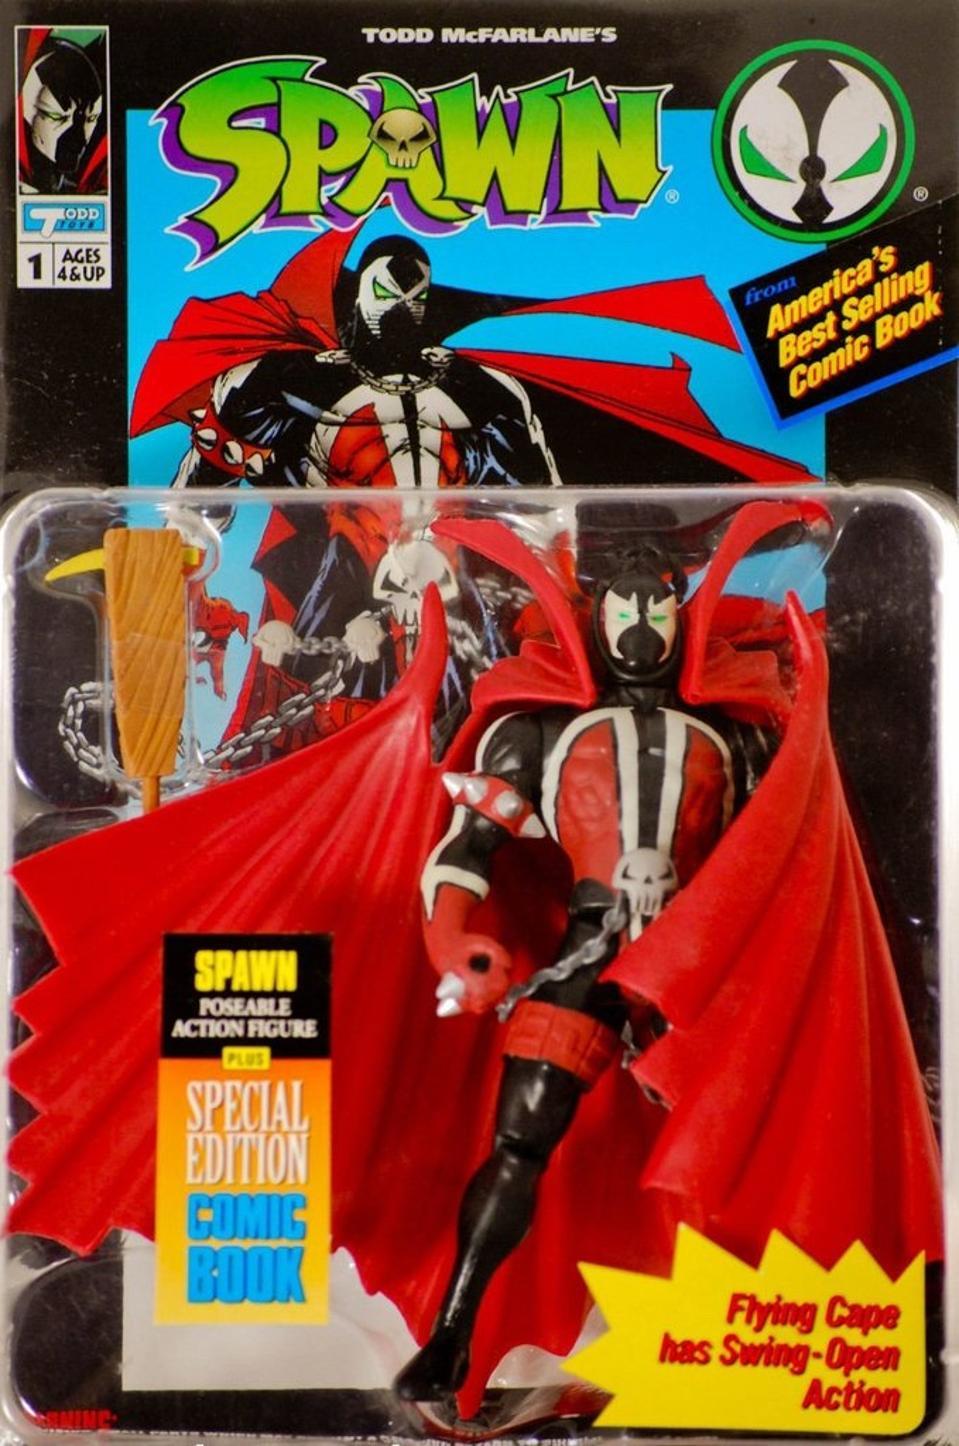 McFarlane Spawn toys action figure collectible